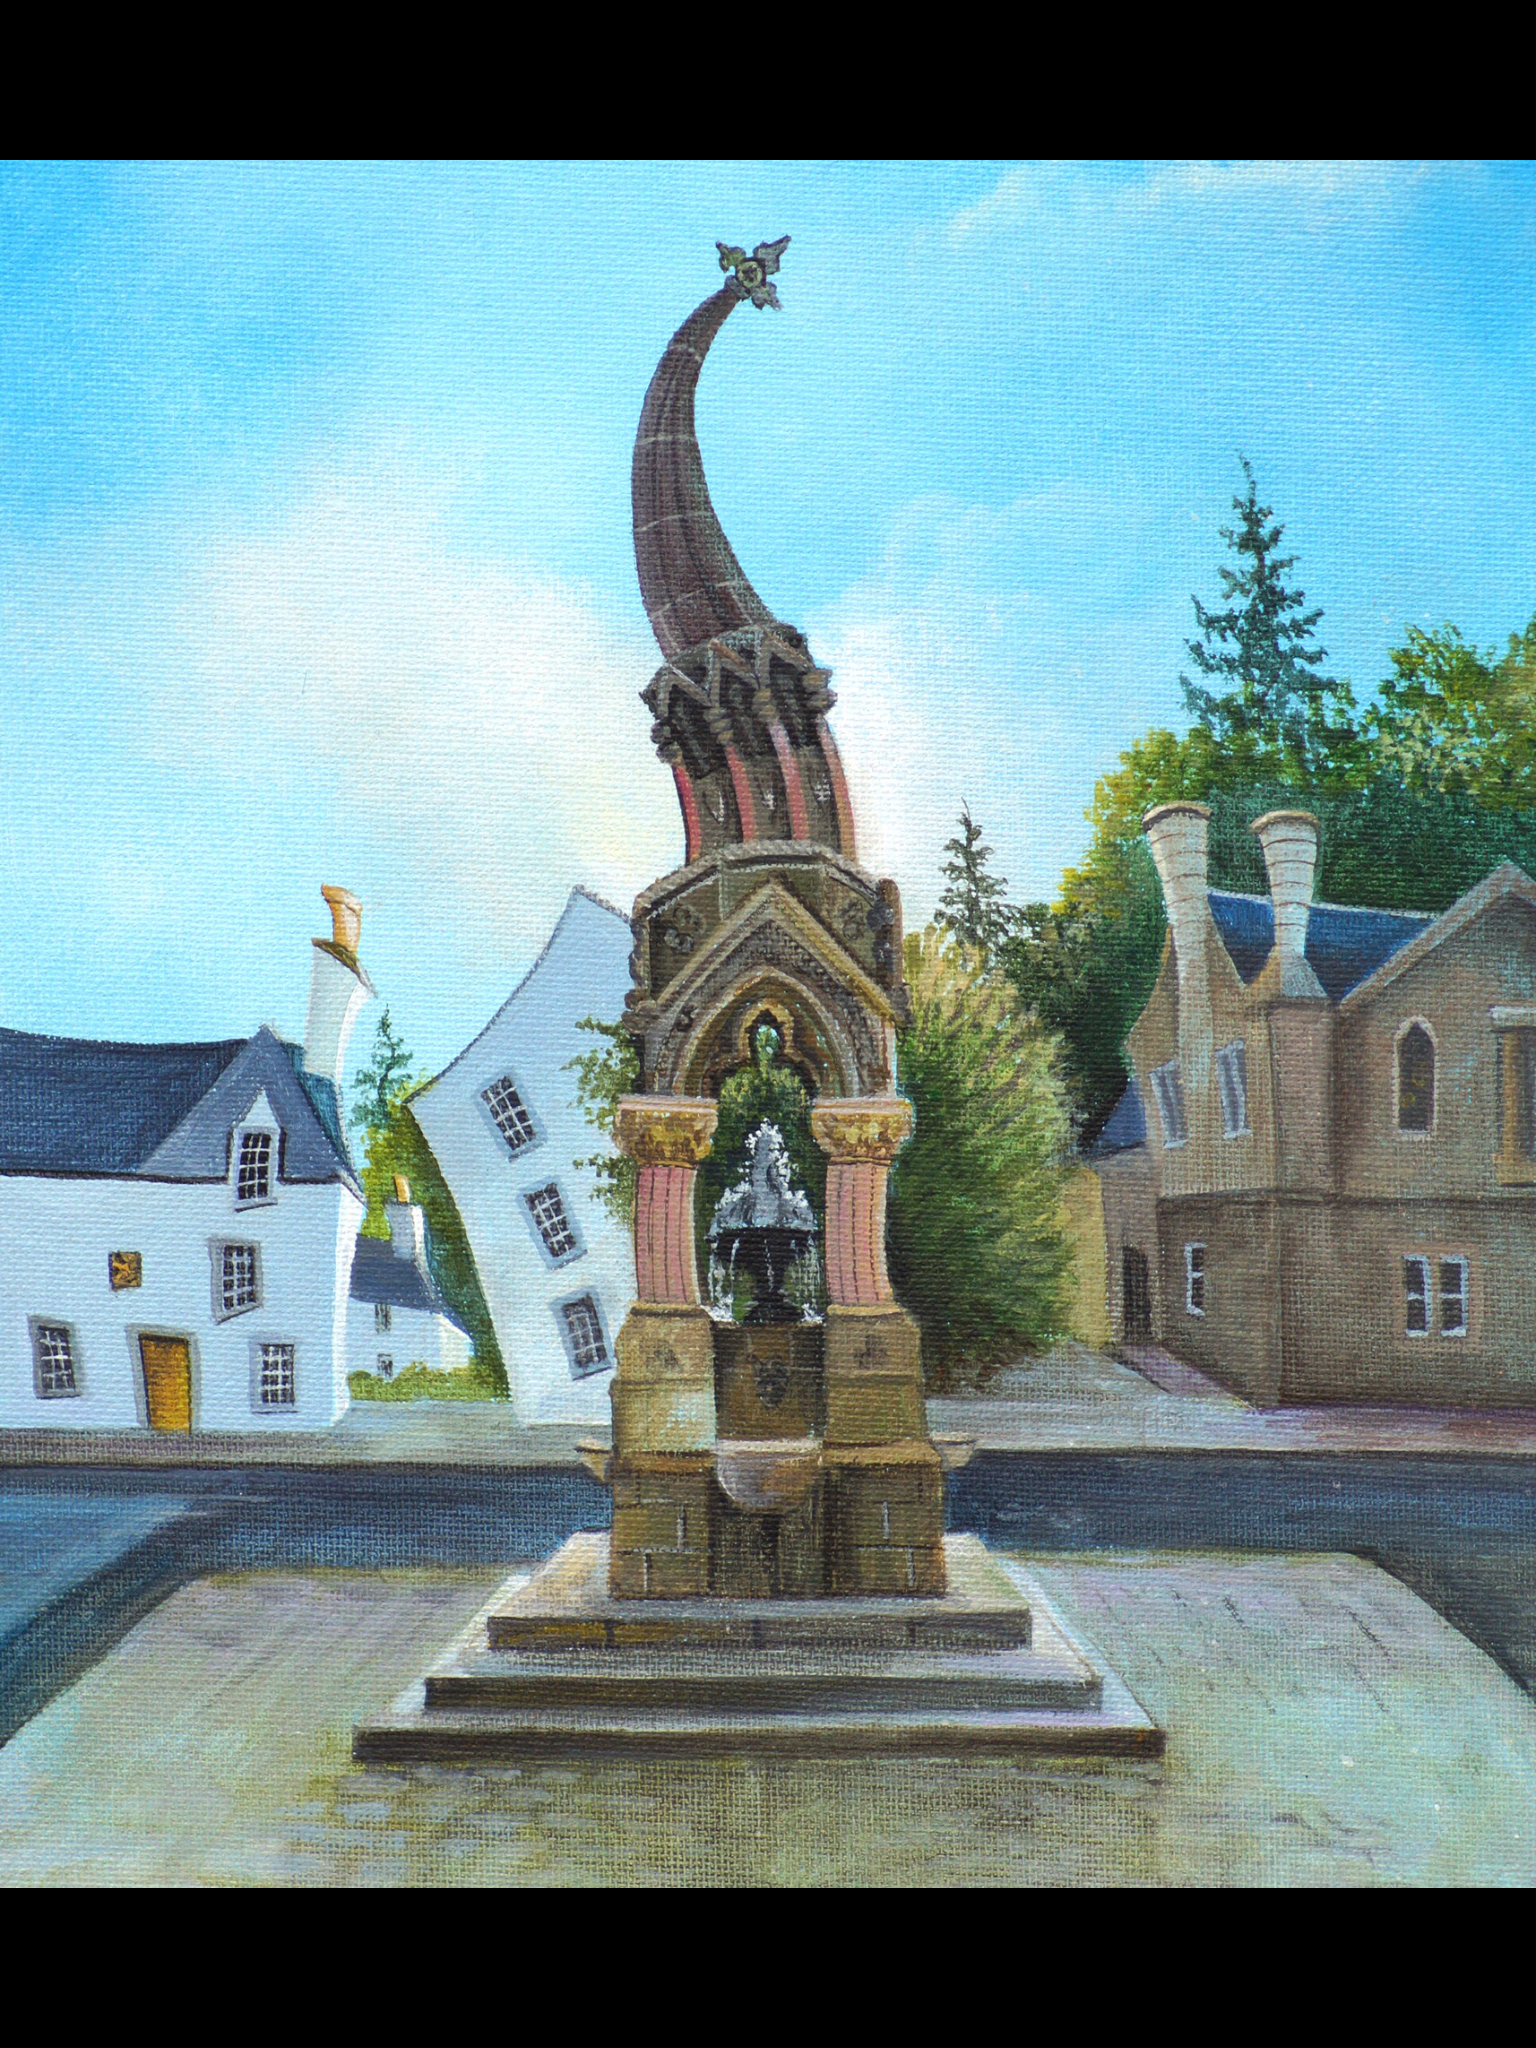 Atholl Fountain